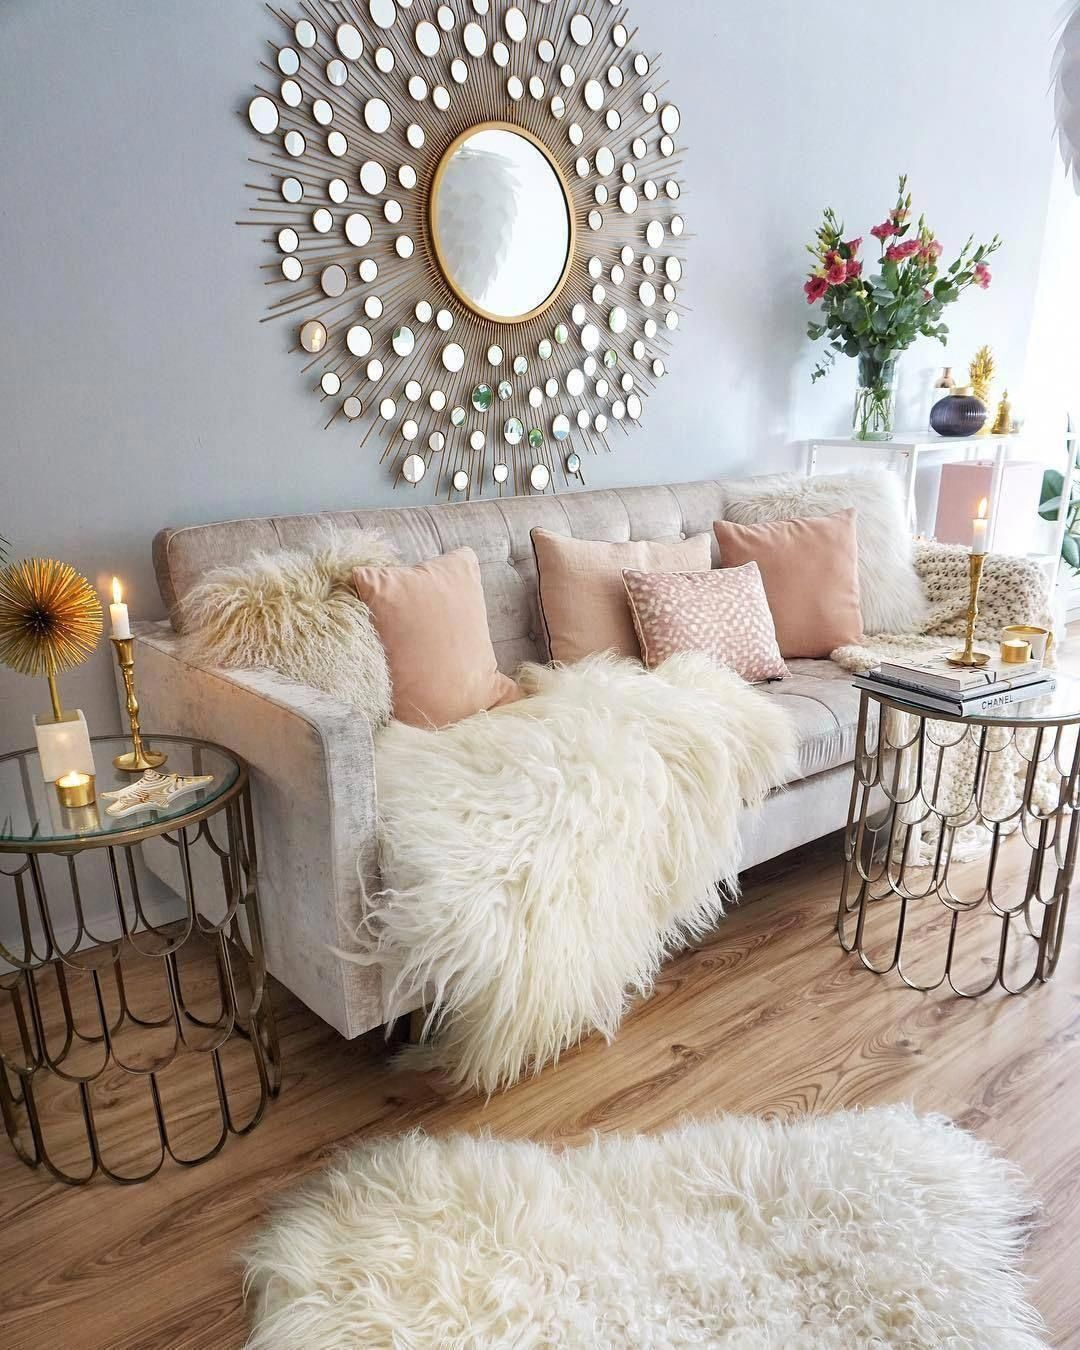 Modern Glam Living Room Decorating Ideas 19: Amicable Revitalized Living Room Decor Hacks Internet